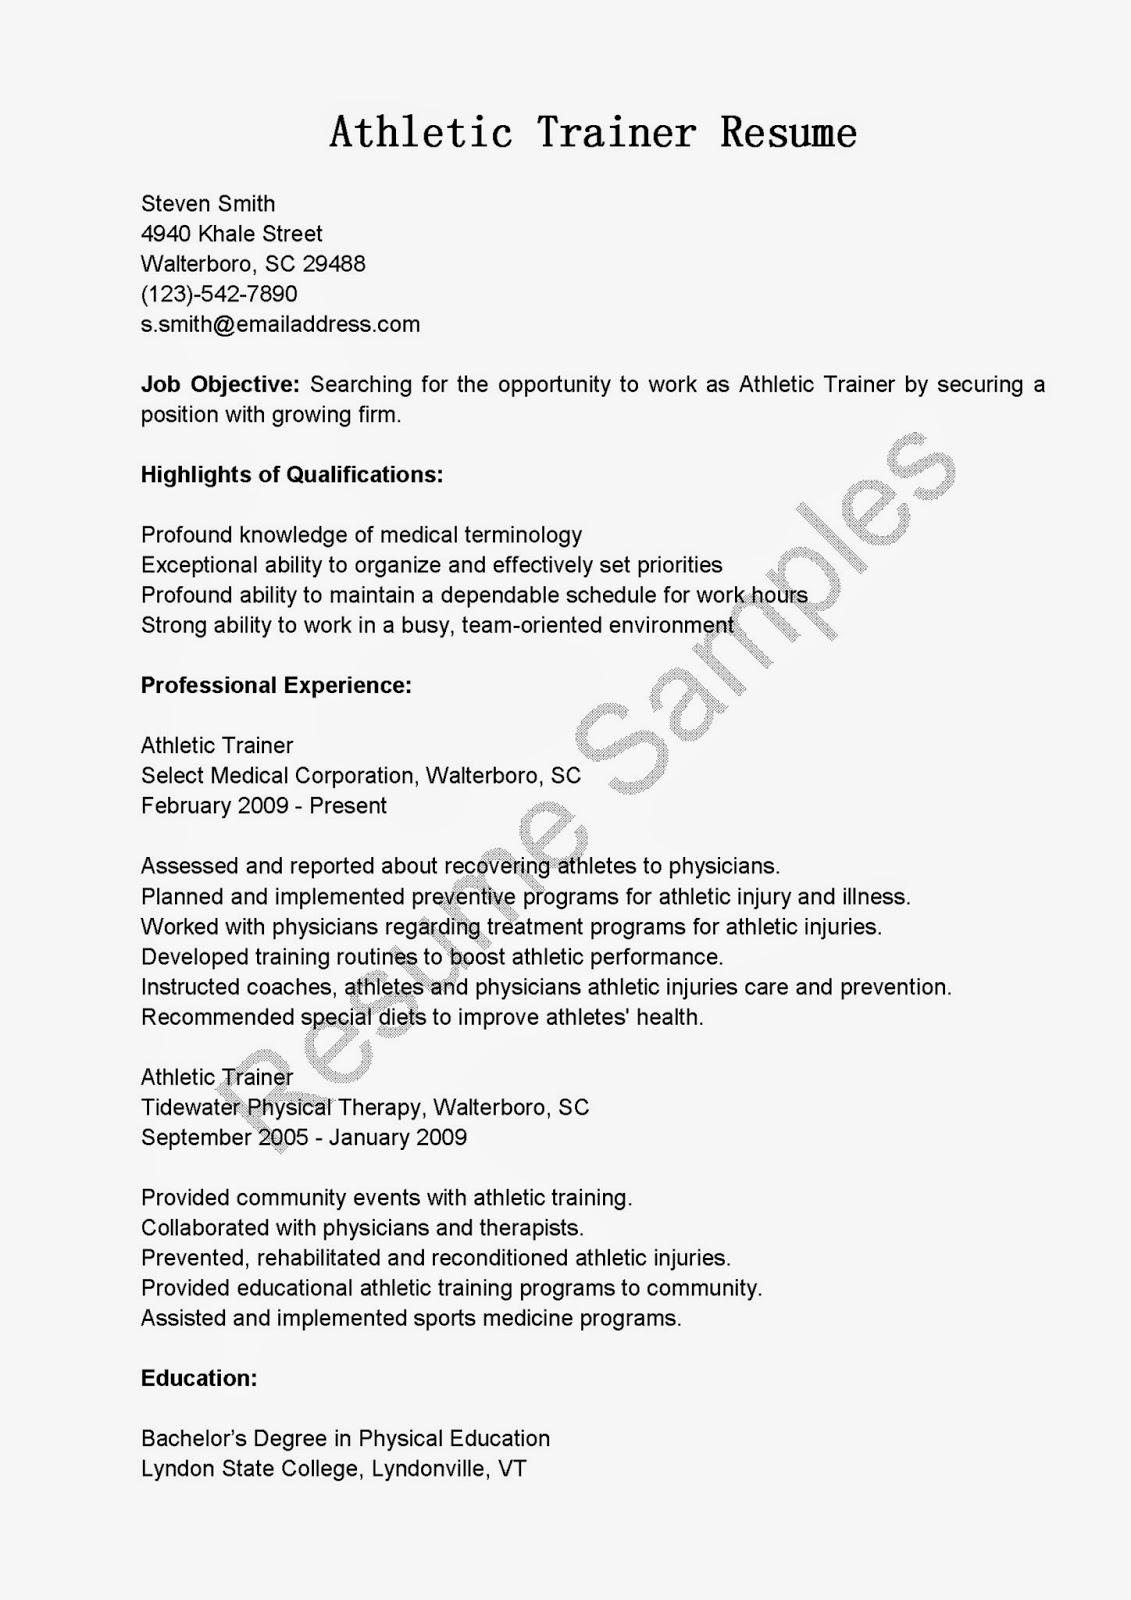 education trainer resume sample best resume examples for your education trainer resume sample education resume cv samples resume samples athletic trainer resume sample